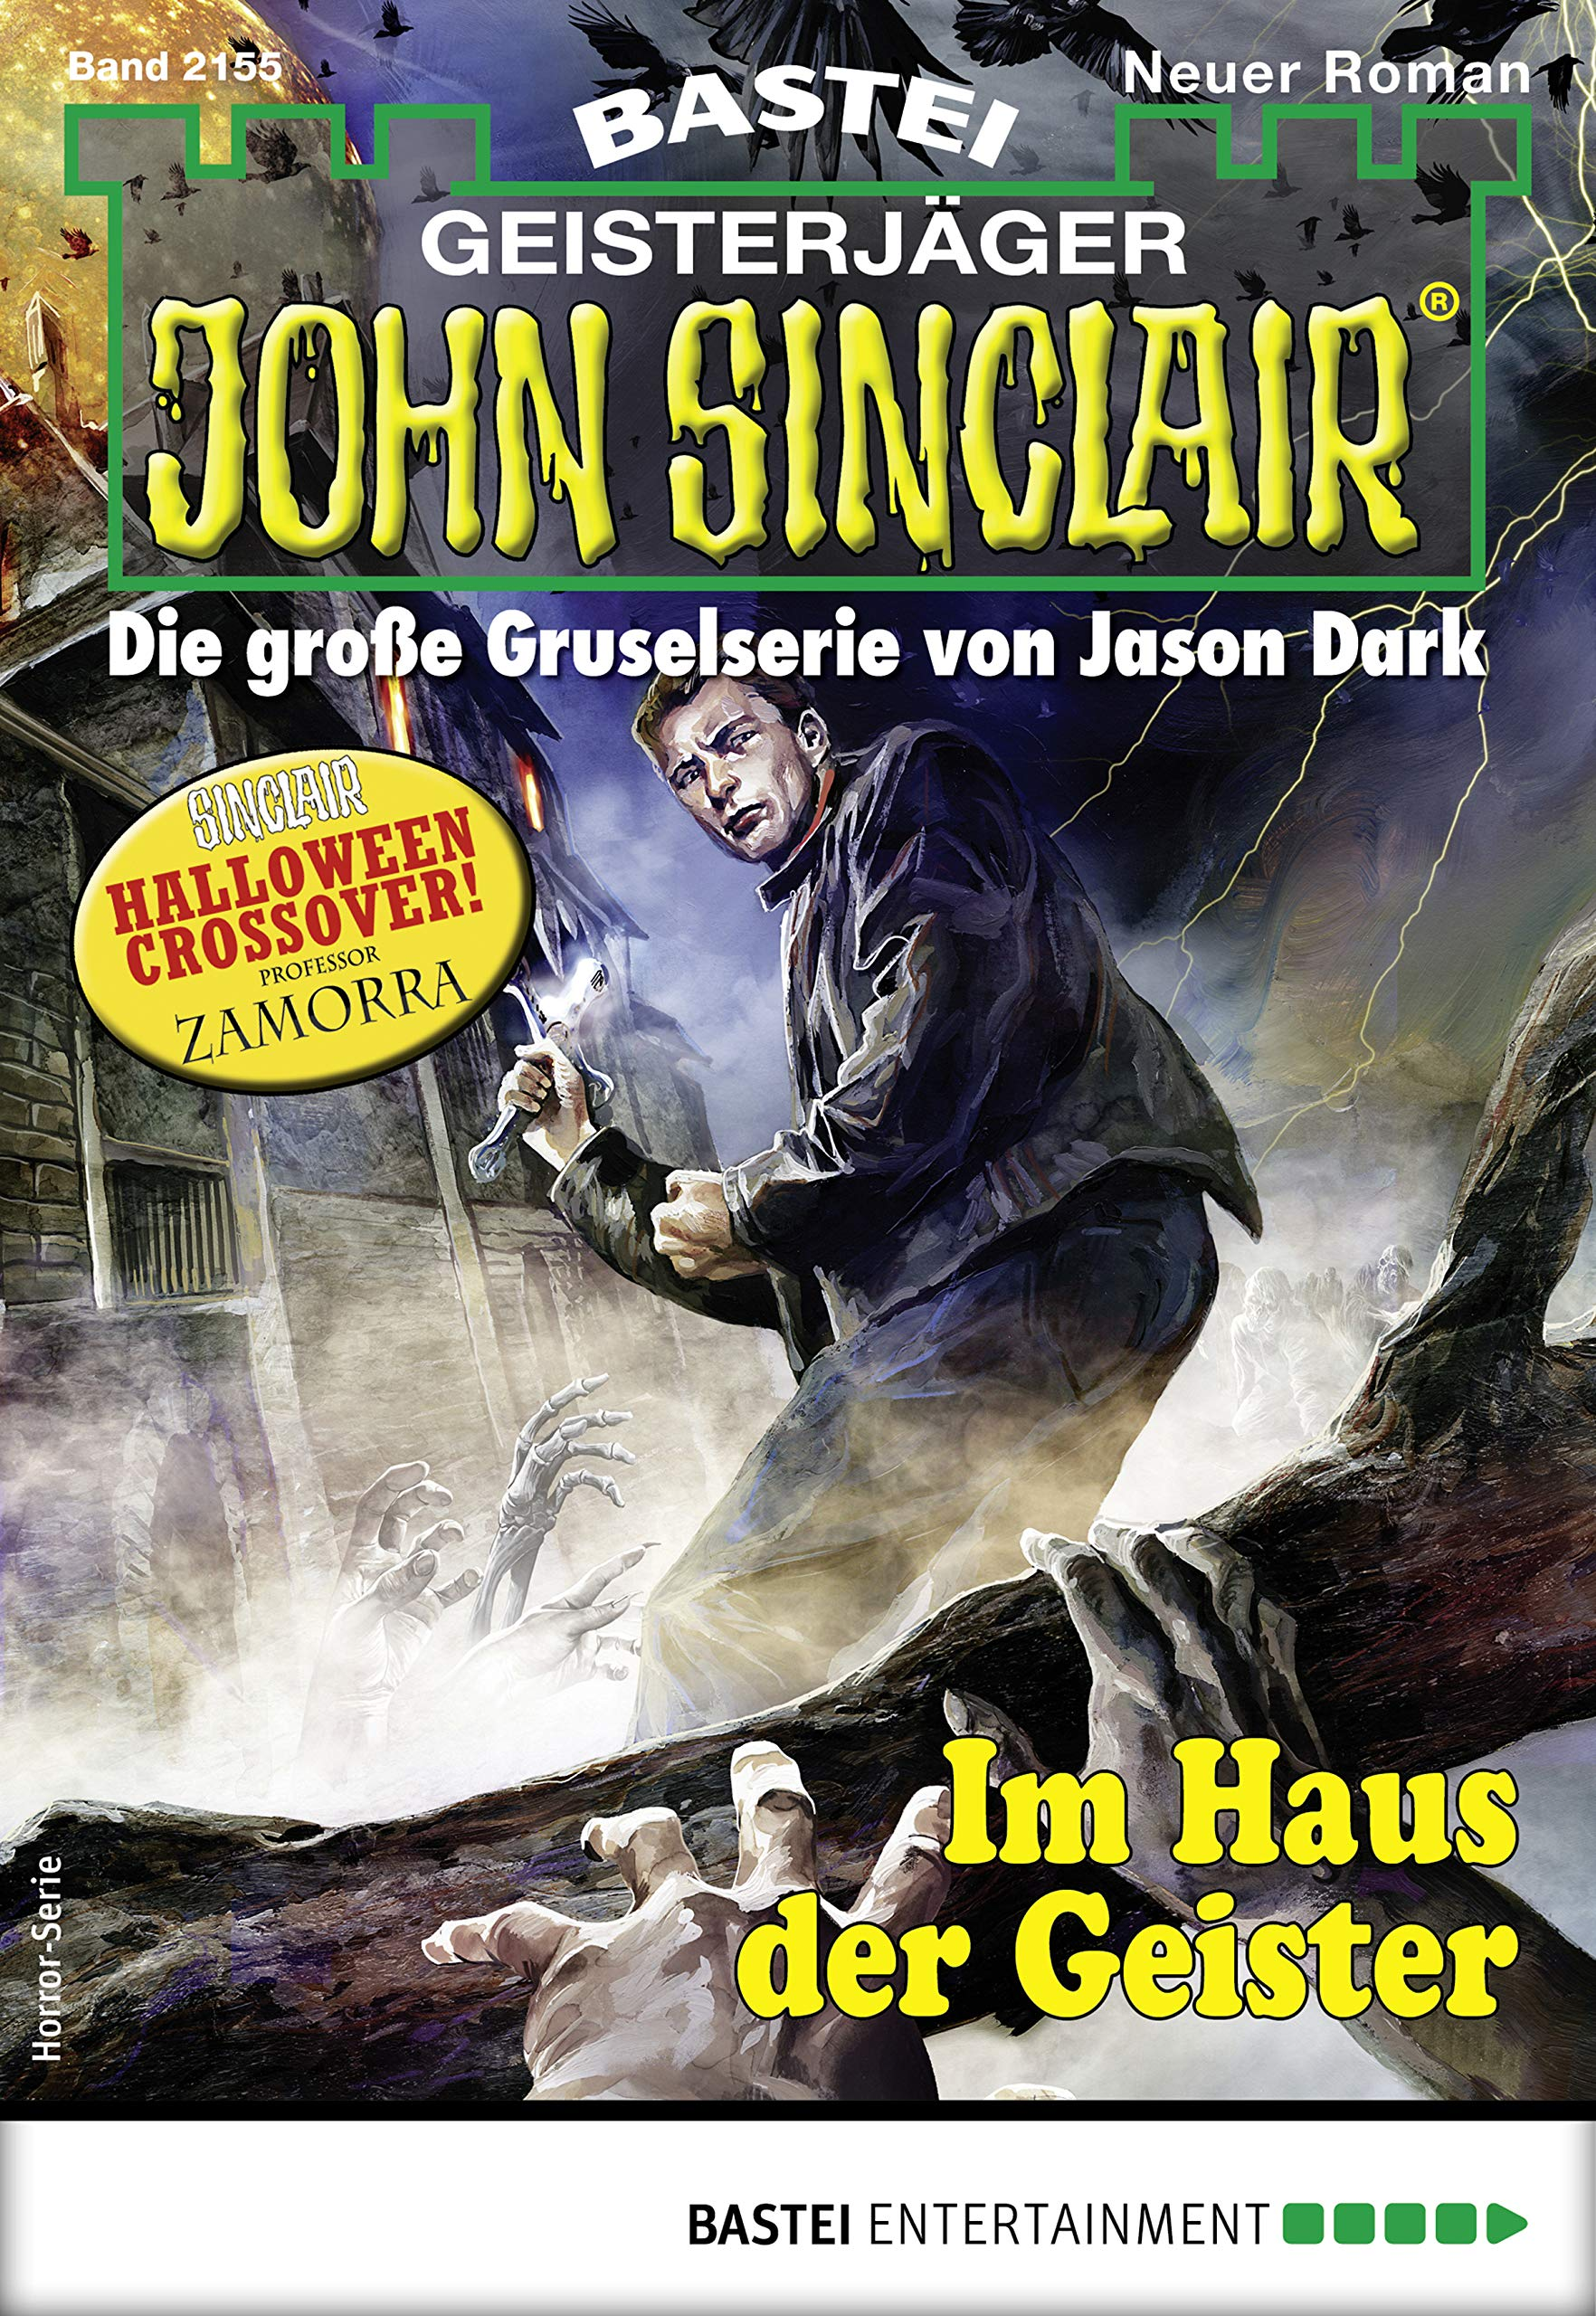 John Sinclair 2155 - Horror-Serie: Im Haus der Geister